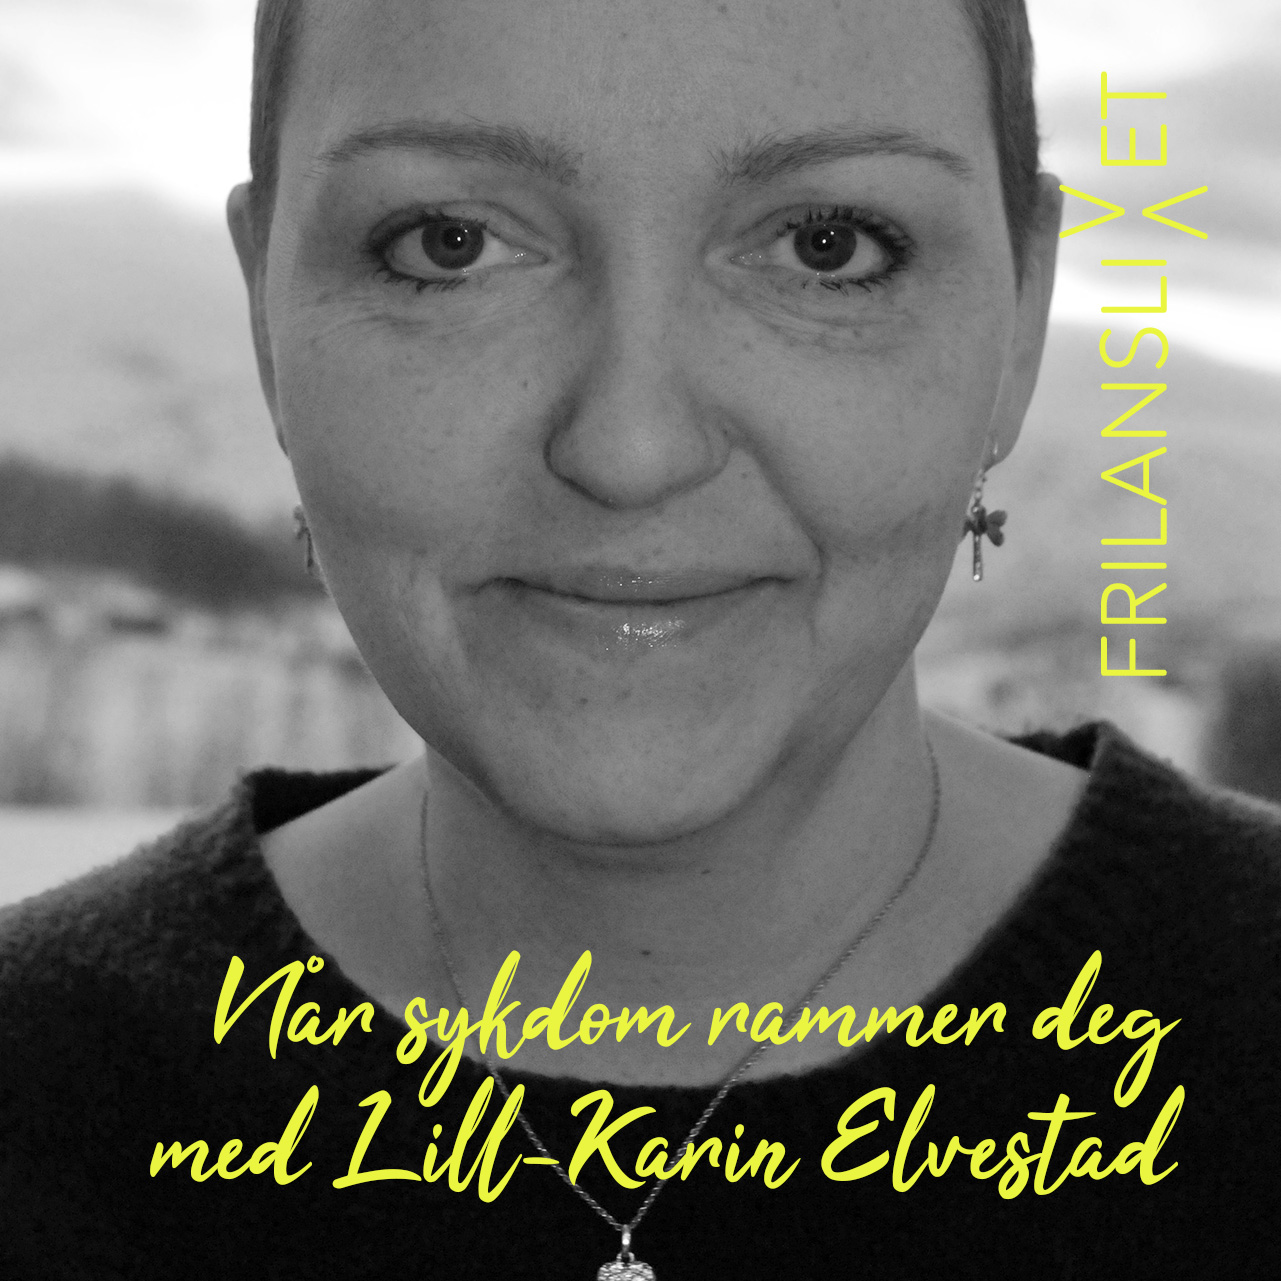 Foto: Gjermund Nilssen